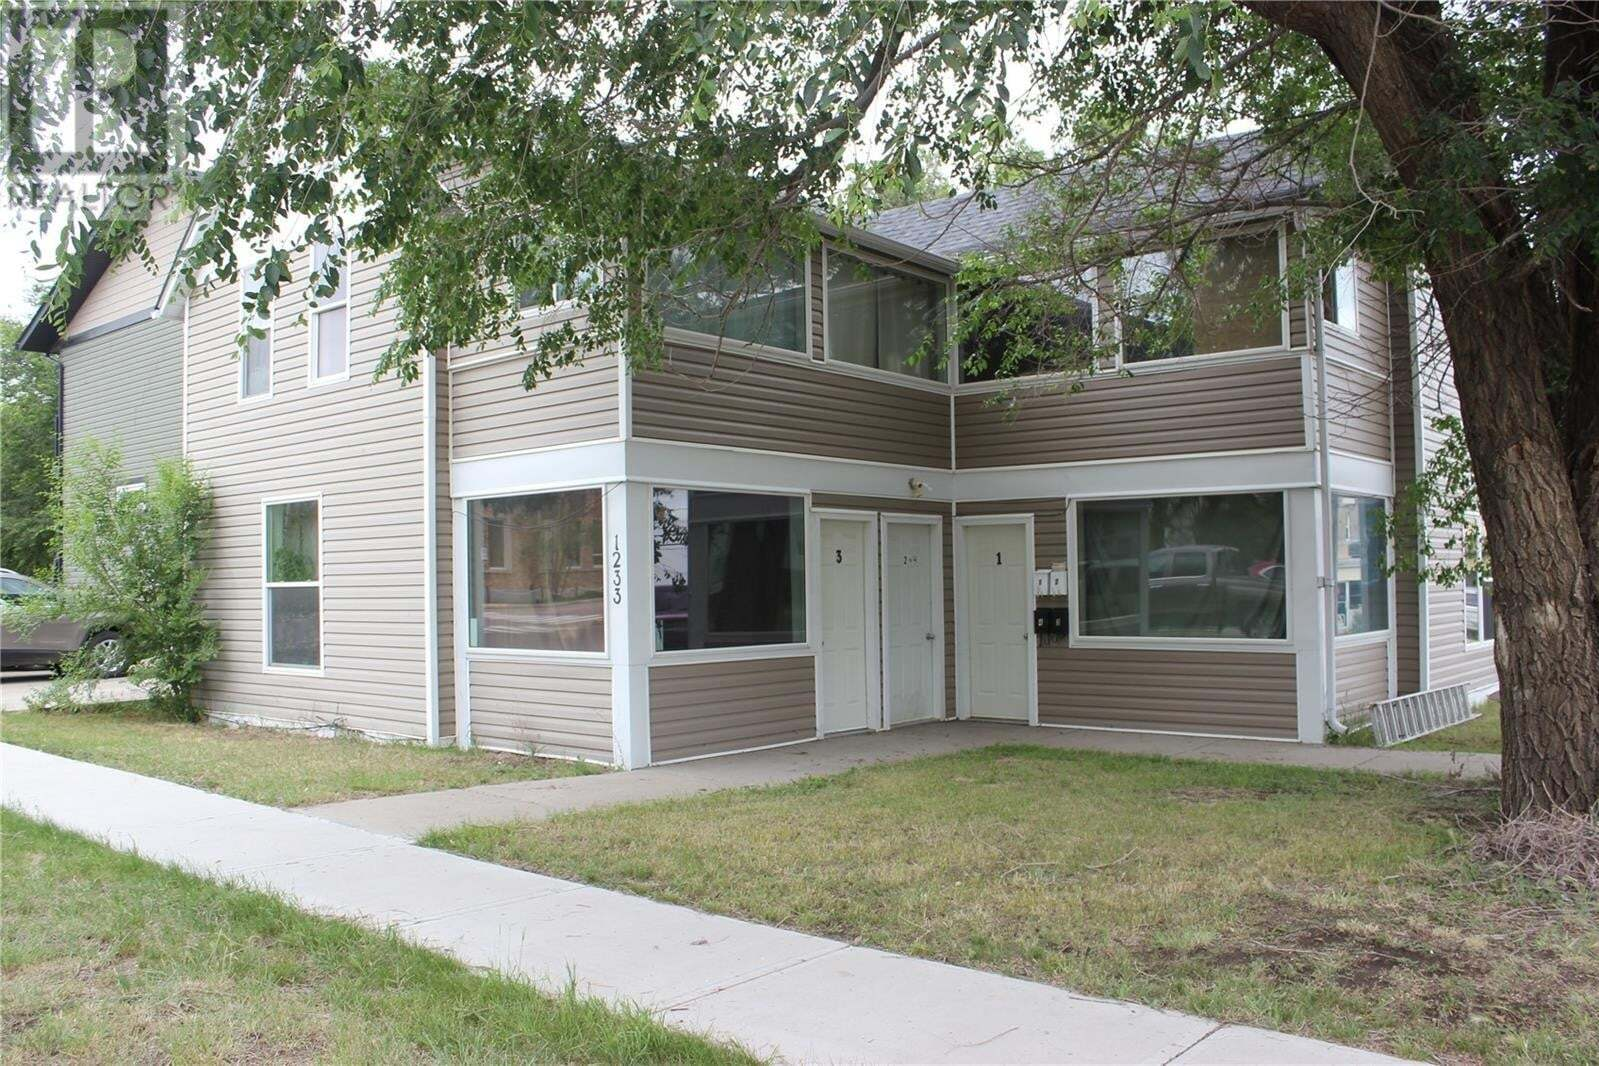 Townhouse for sale at 1233 3rd St Estevan Saskatchewan - MLS: SK814829